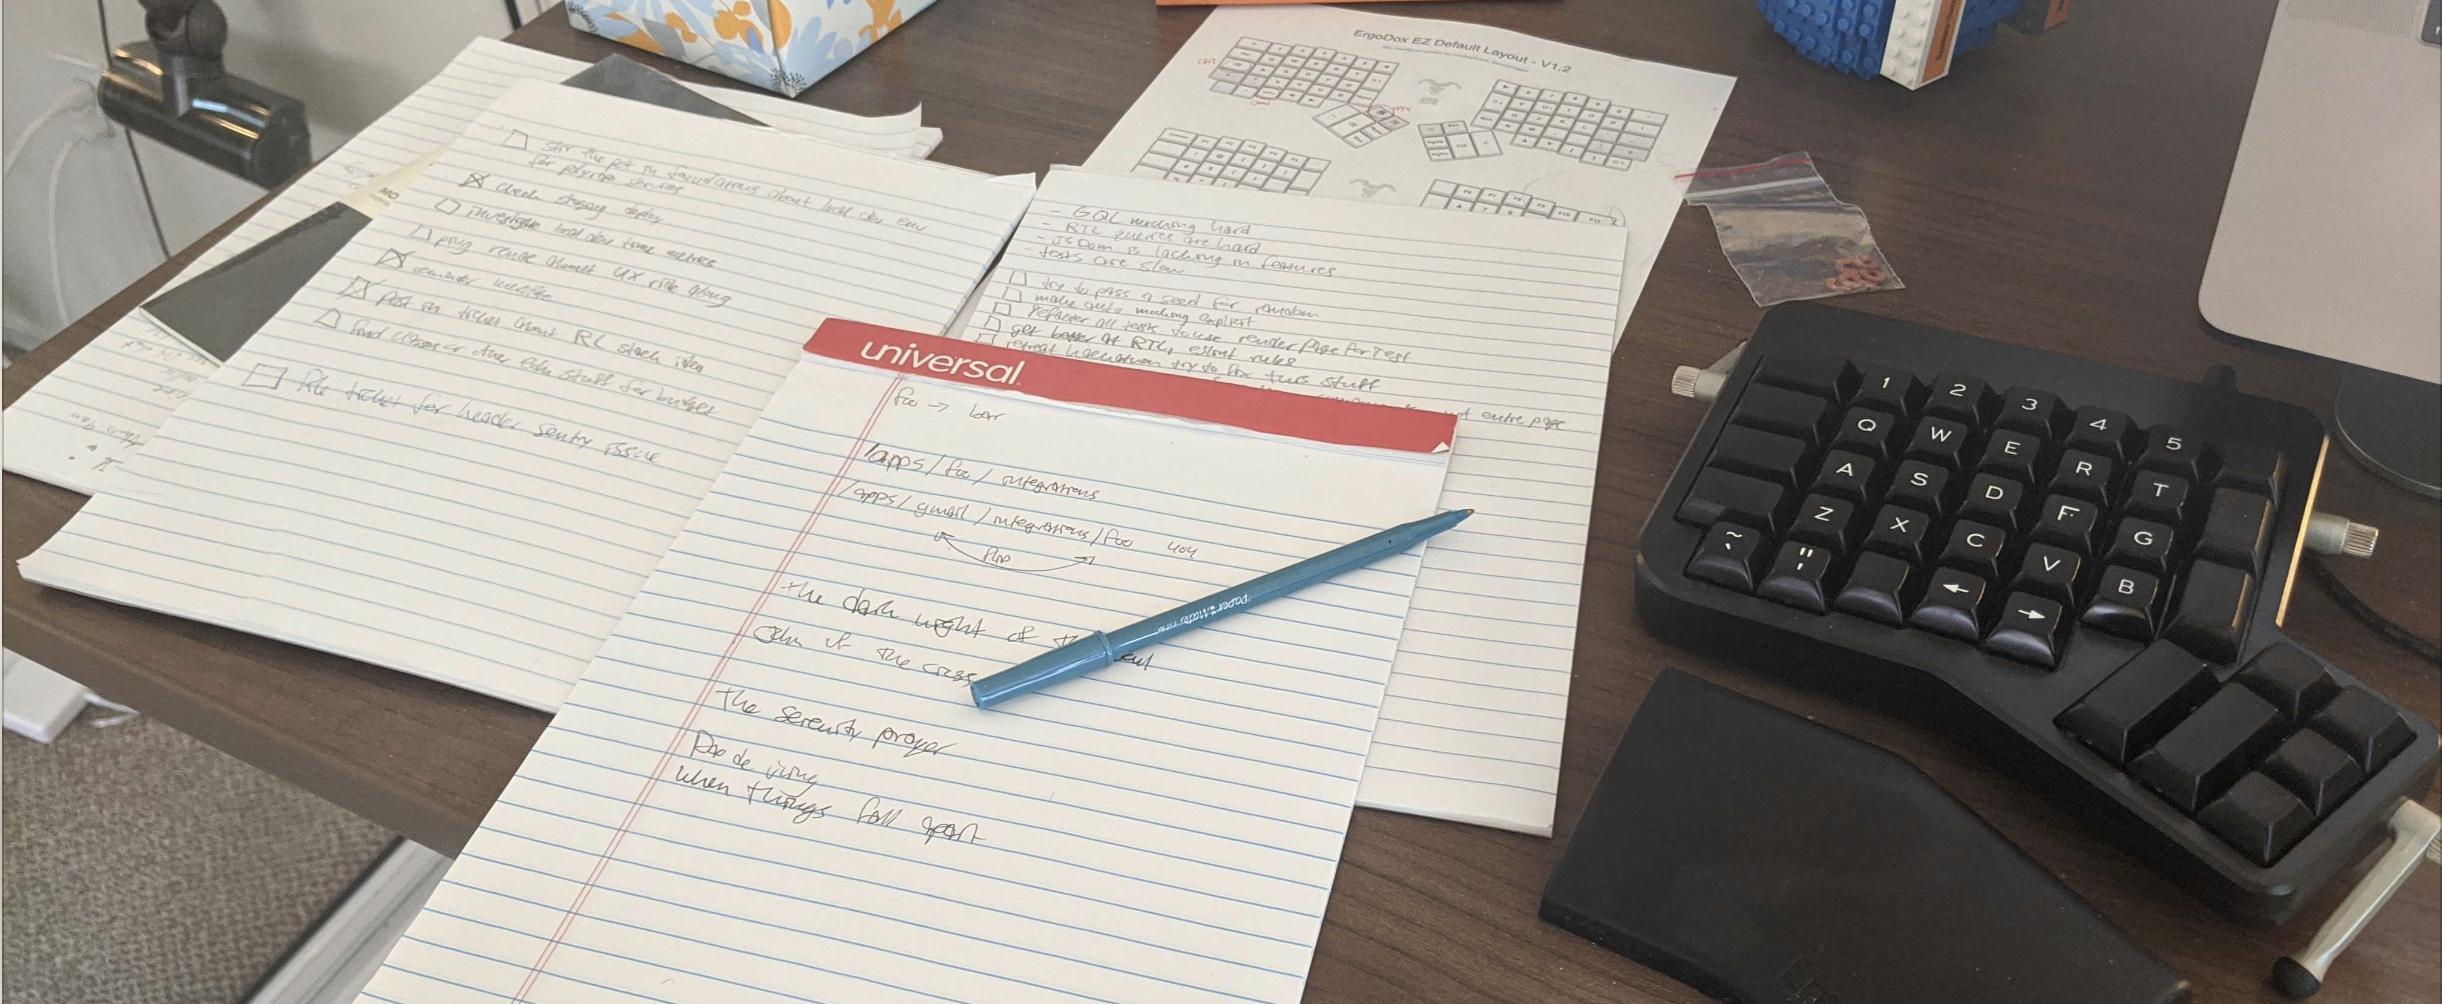 Chris' paper notes